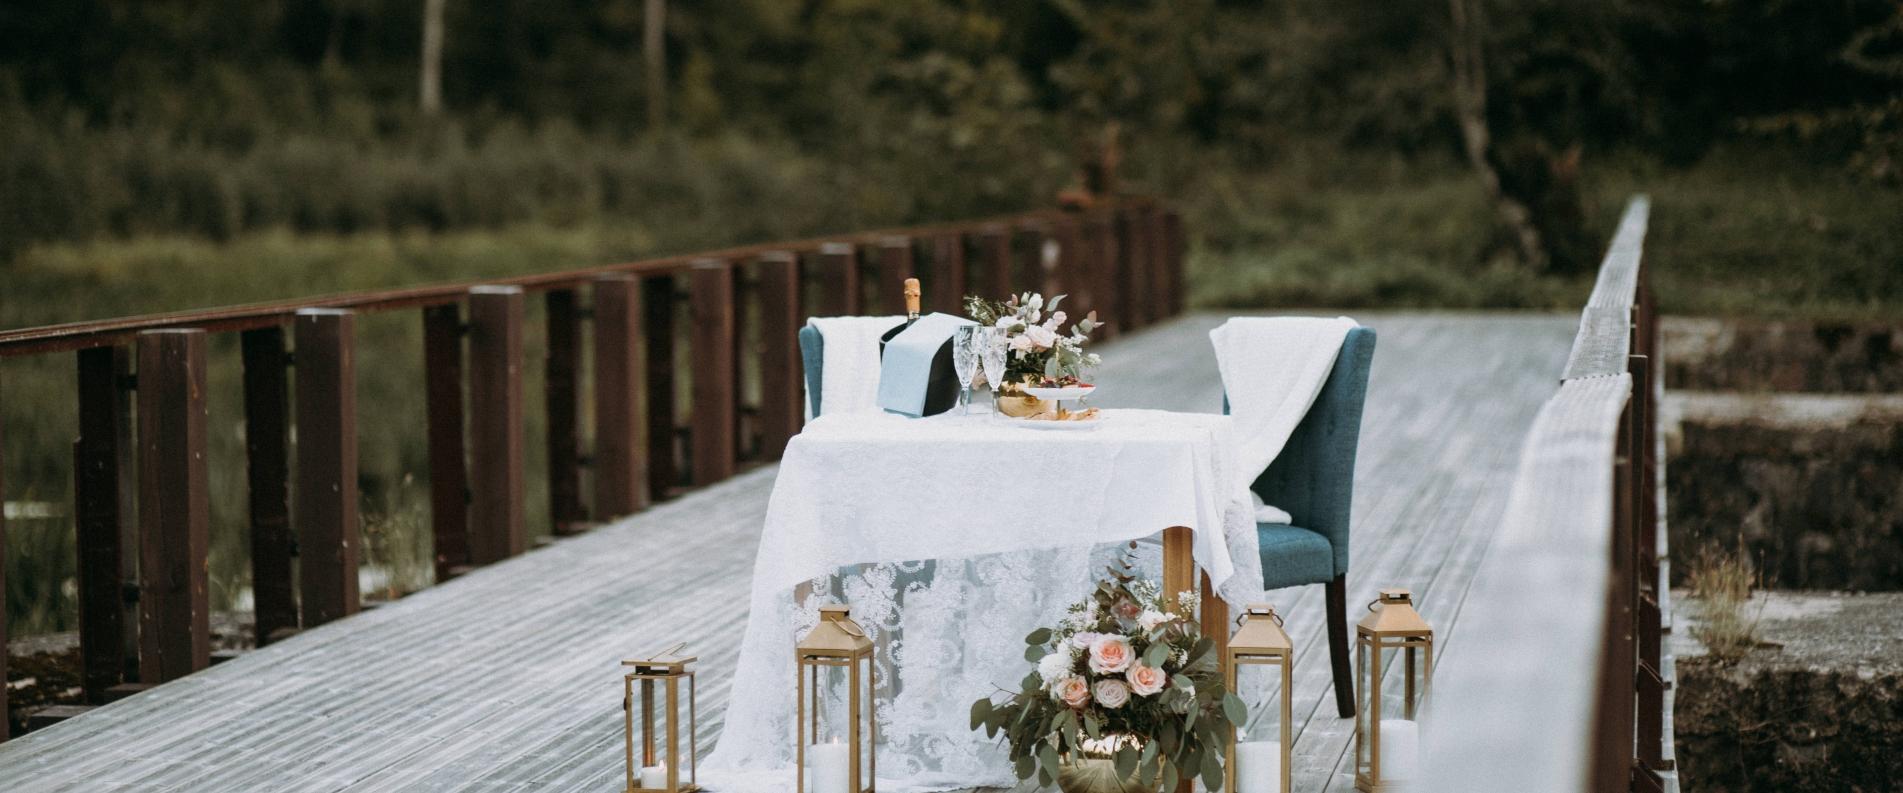 dace-haralds-by-miks-sels-weddings-627_5524-165df0b2e21c877a6e3bd34954909626.jpg